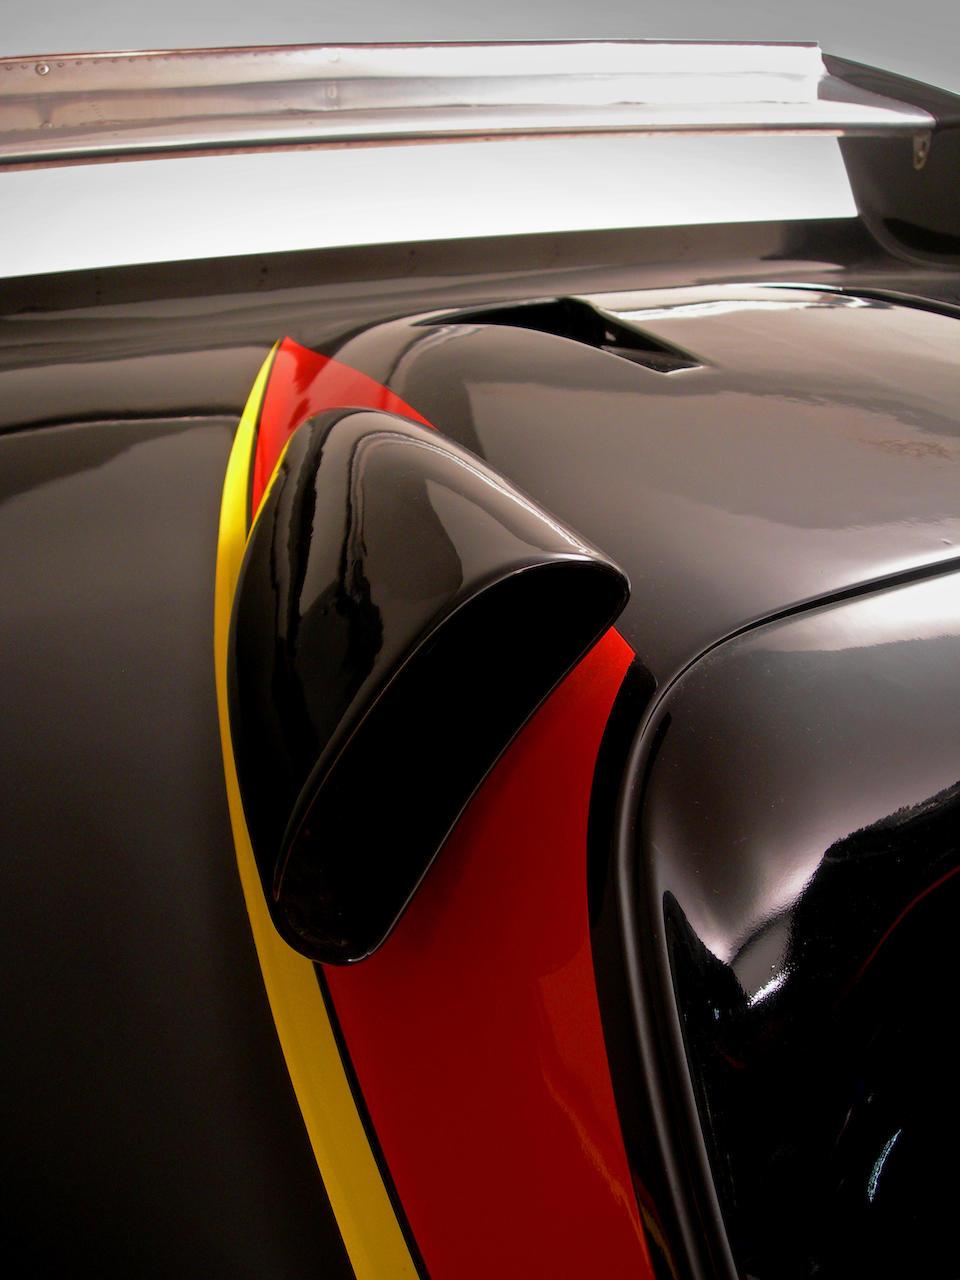 Toj-BMW  Chassis no. SC206 SC7901